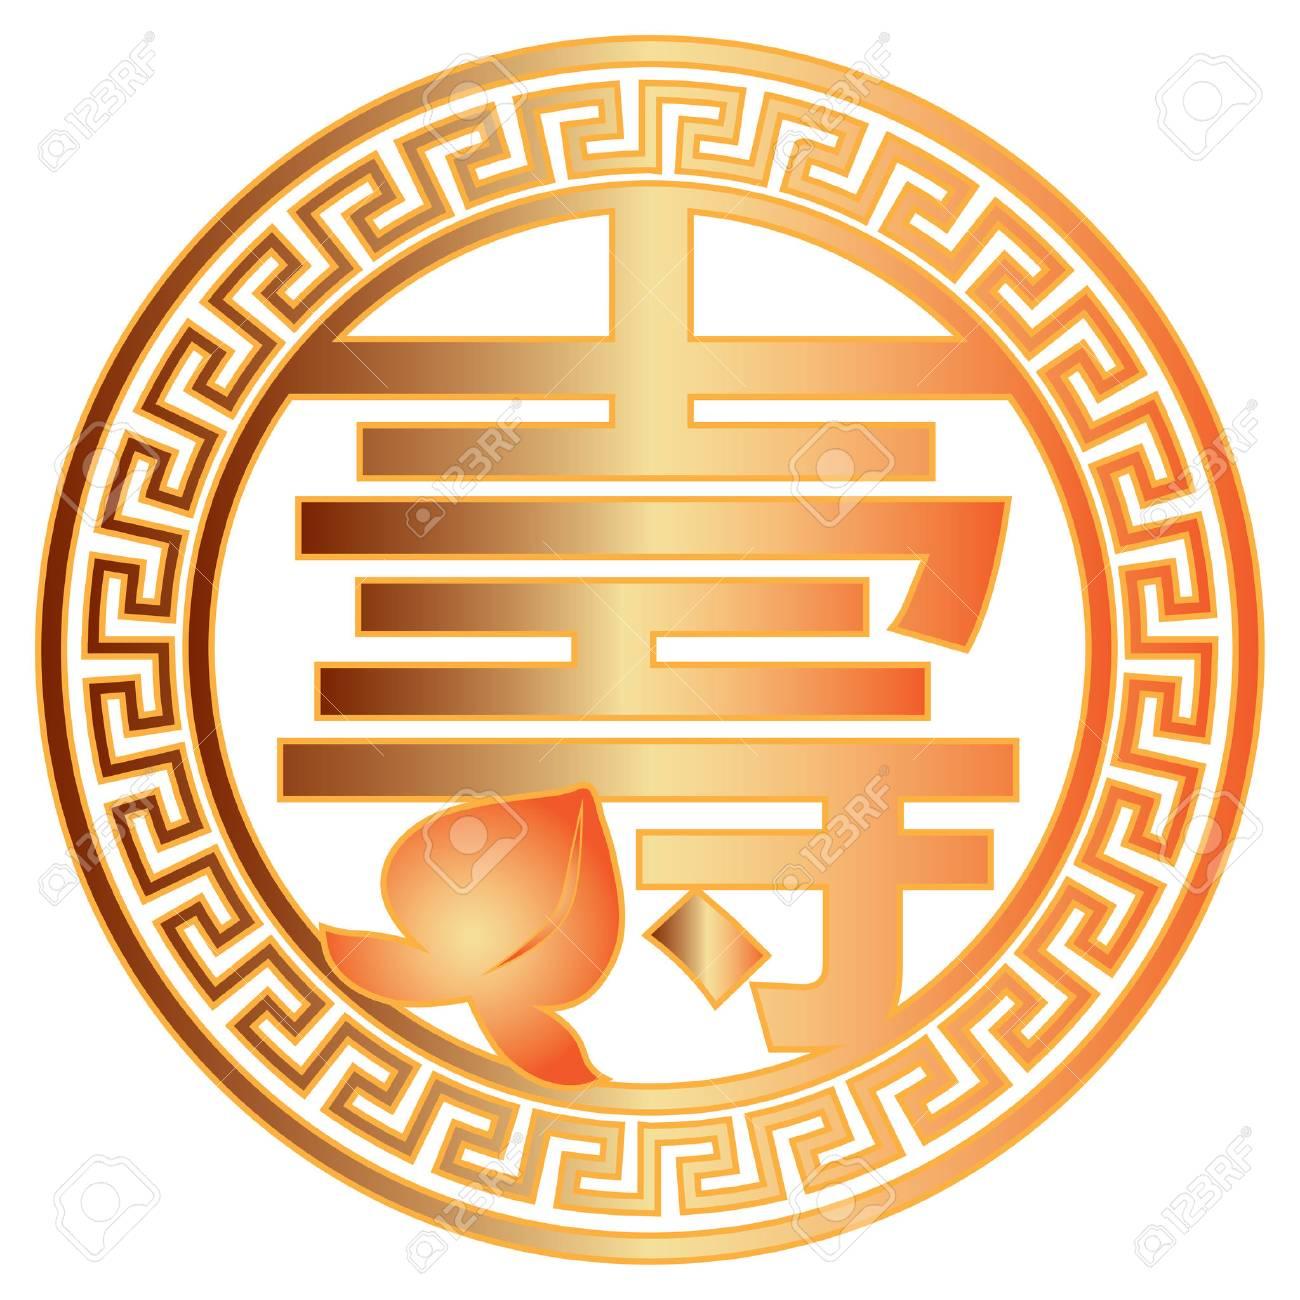 Chinese long life symbol longevity text with peach fruit in circle chinese long life symbol longevity text with peach fruit in circle border for birthday illustration stock buycottarizona Gallery